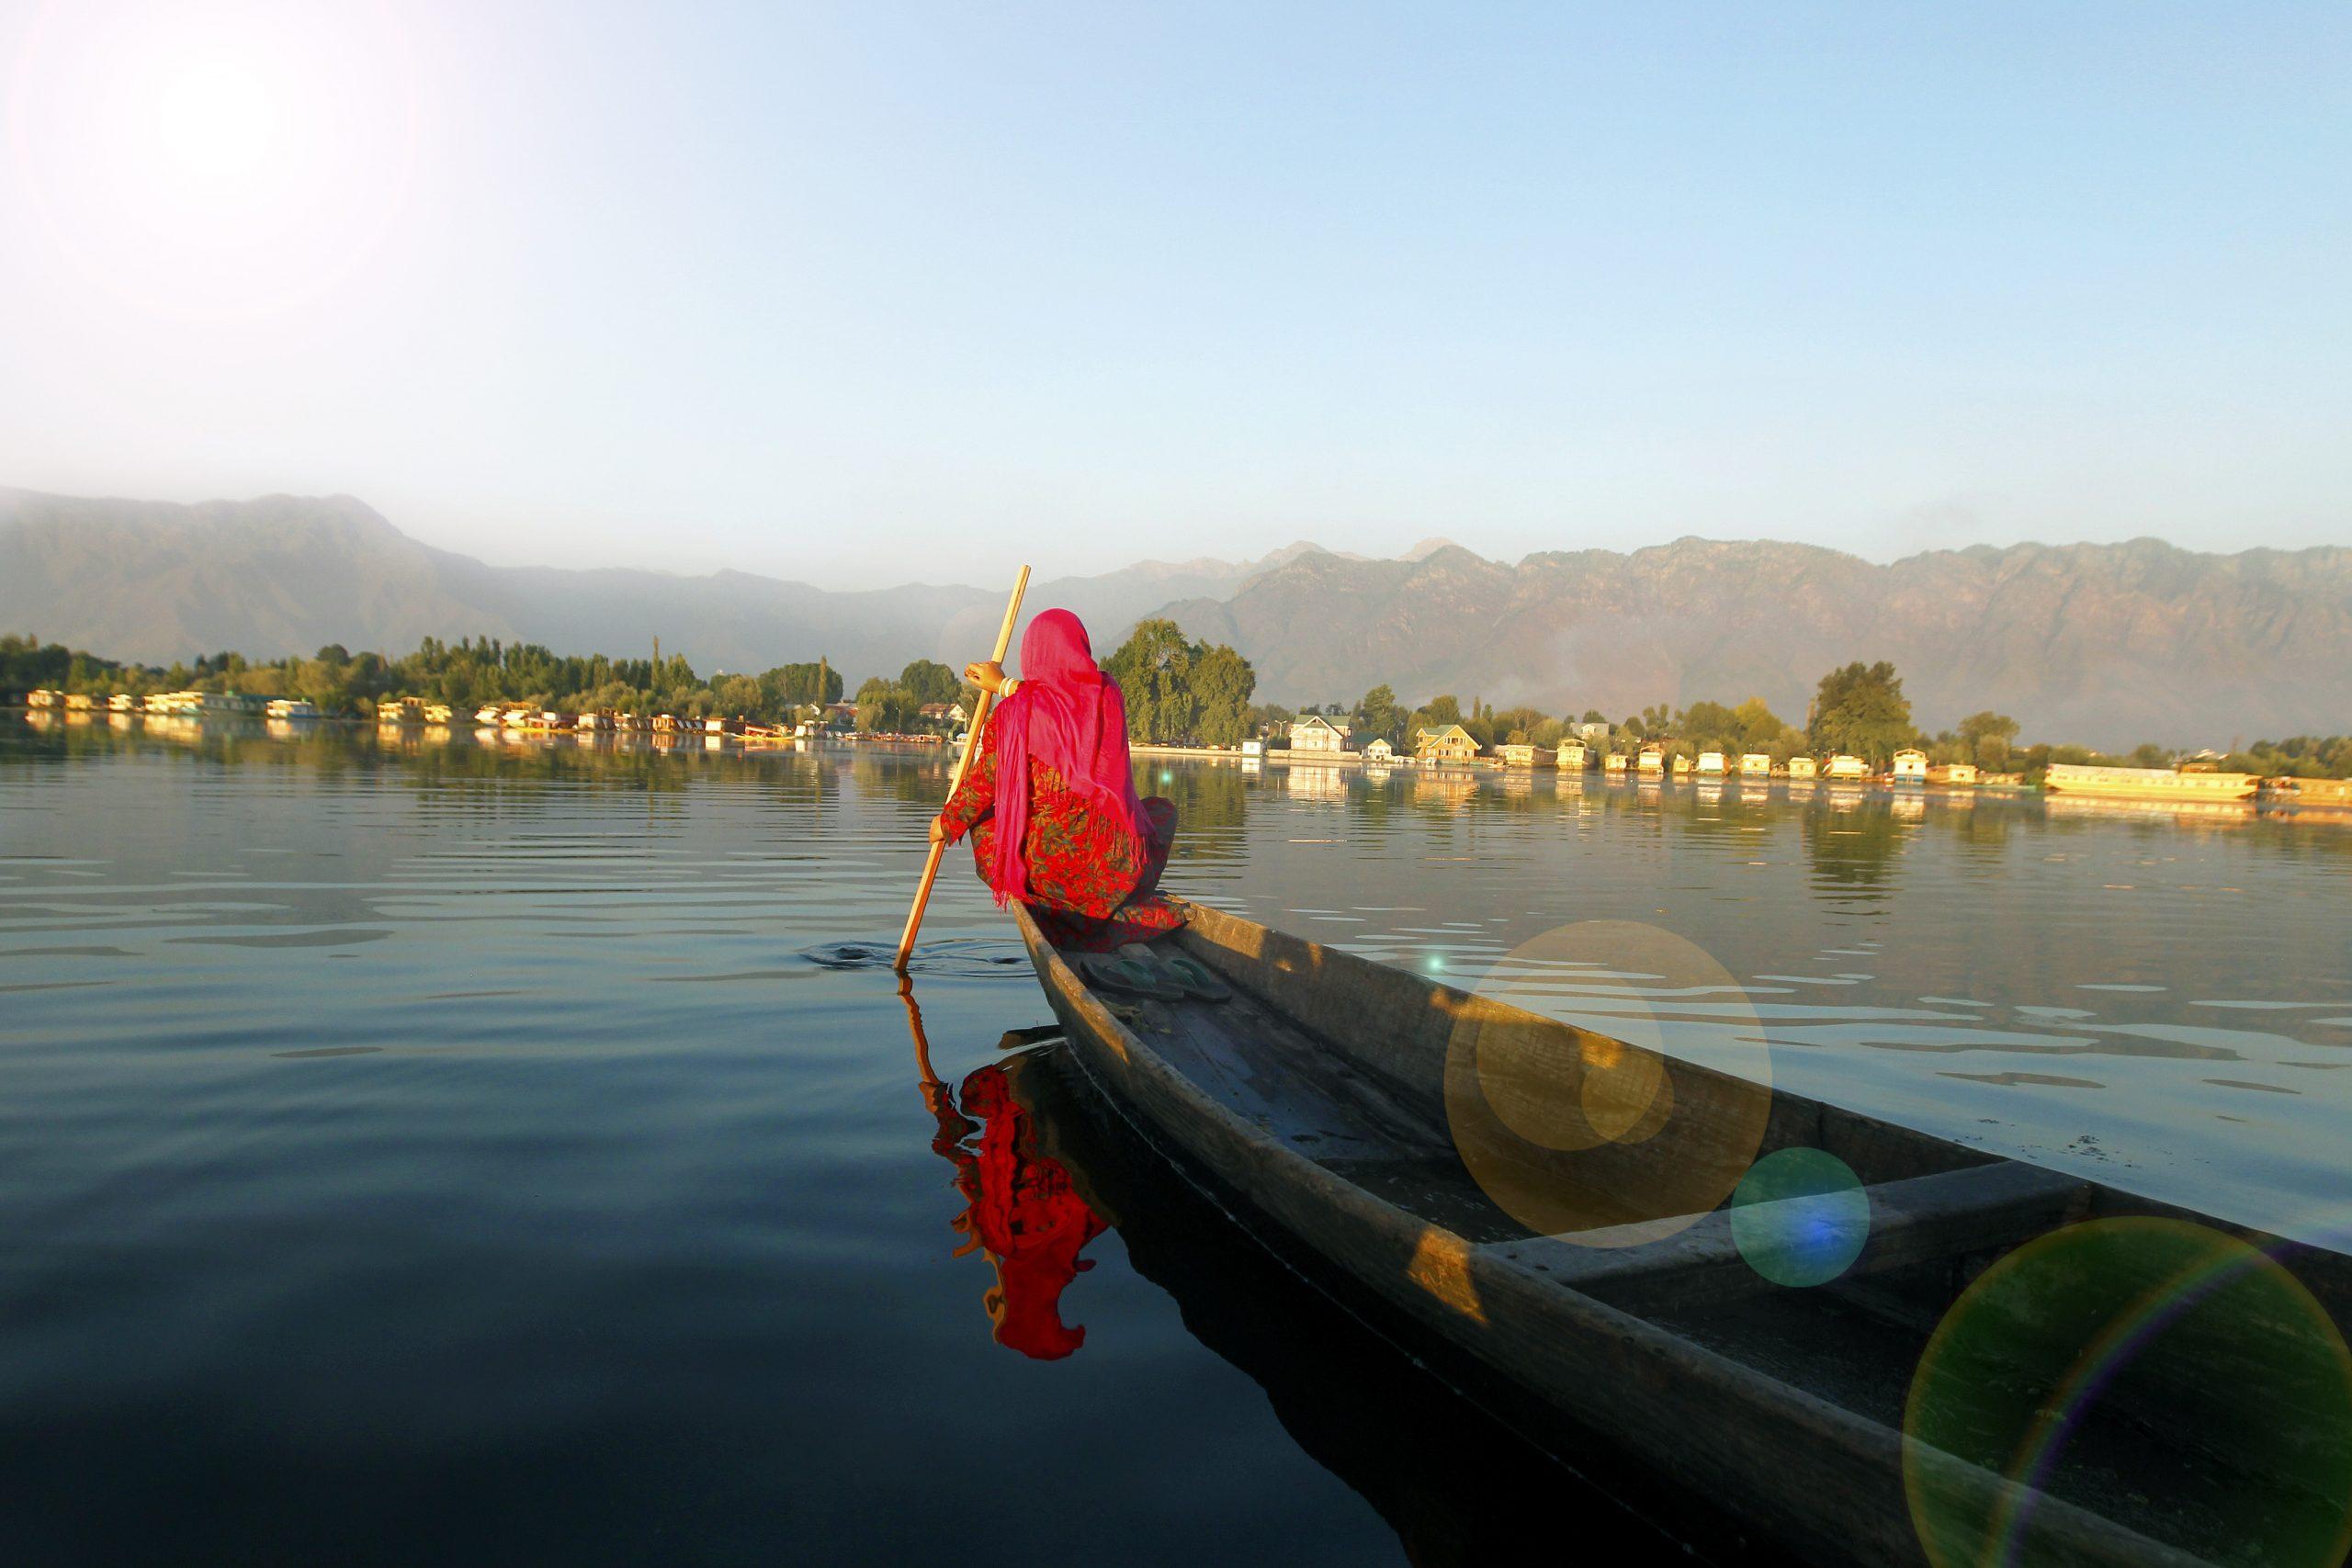 Kashmir: New Normal or Abnormal?